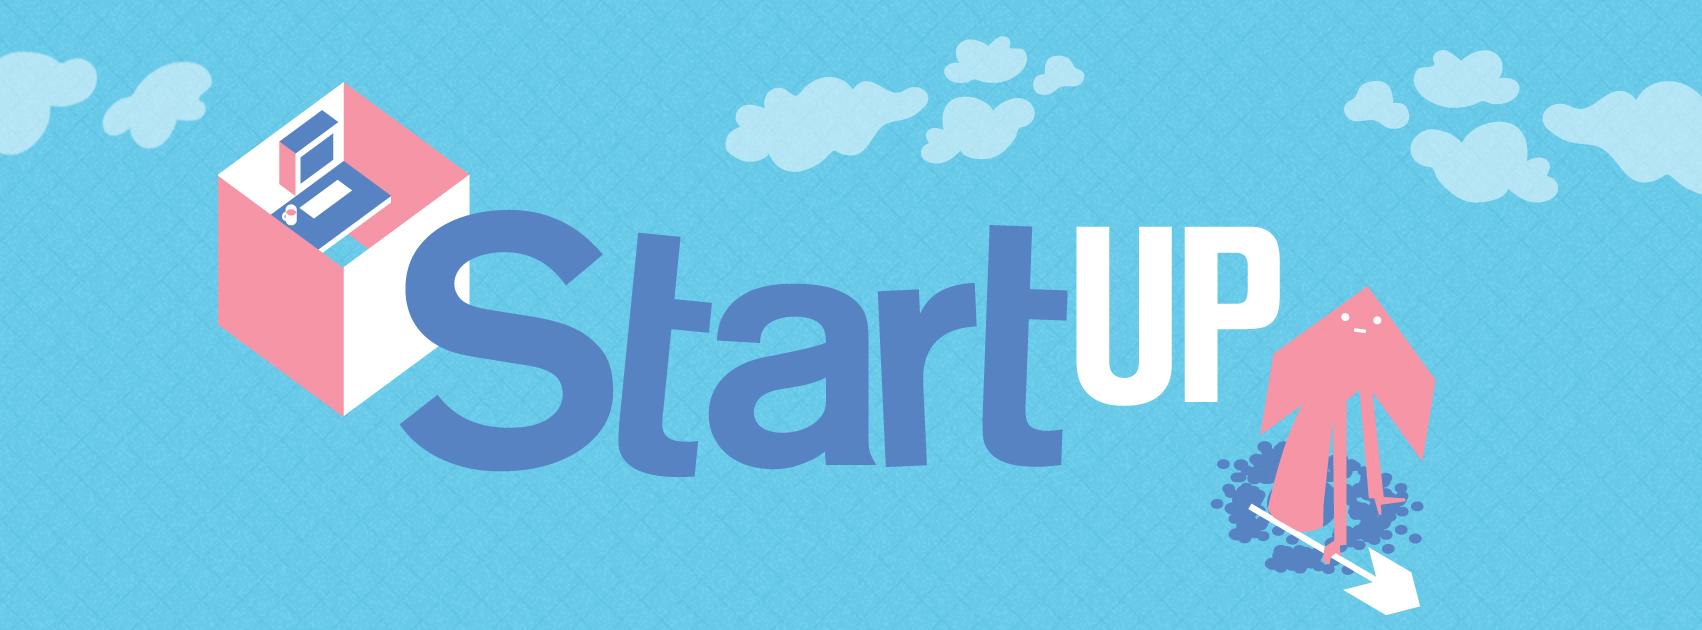 Quarterly Startup Report